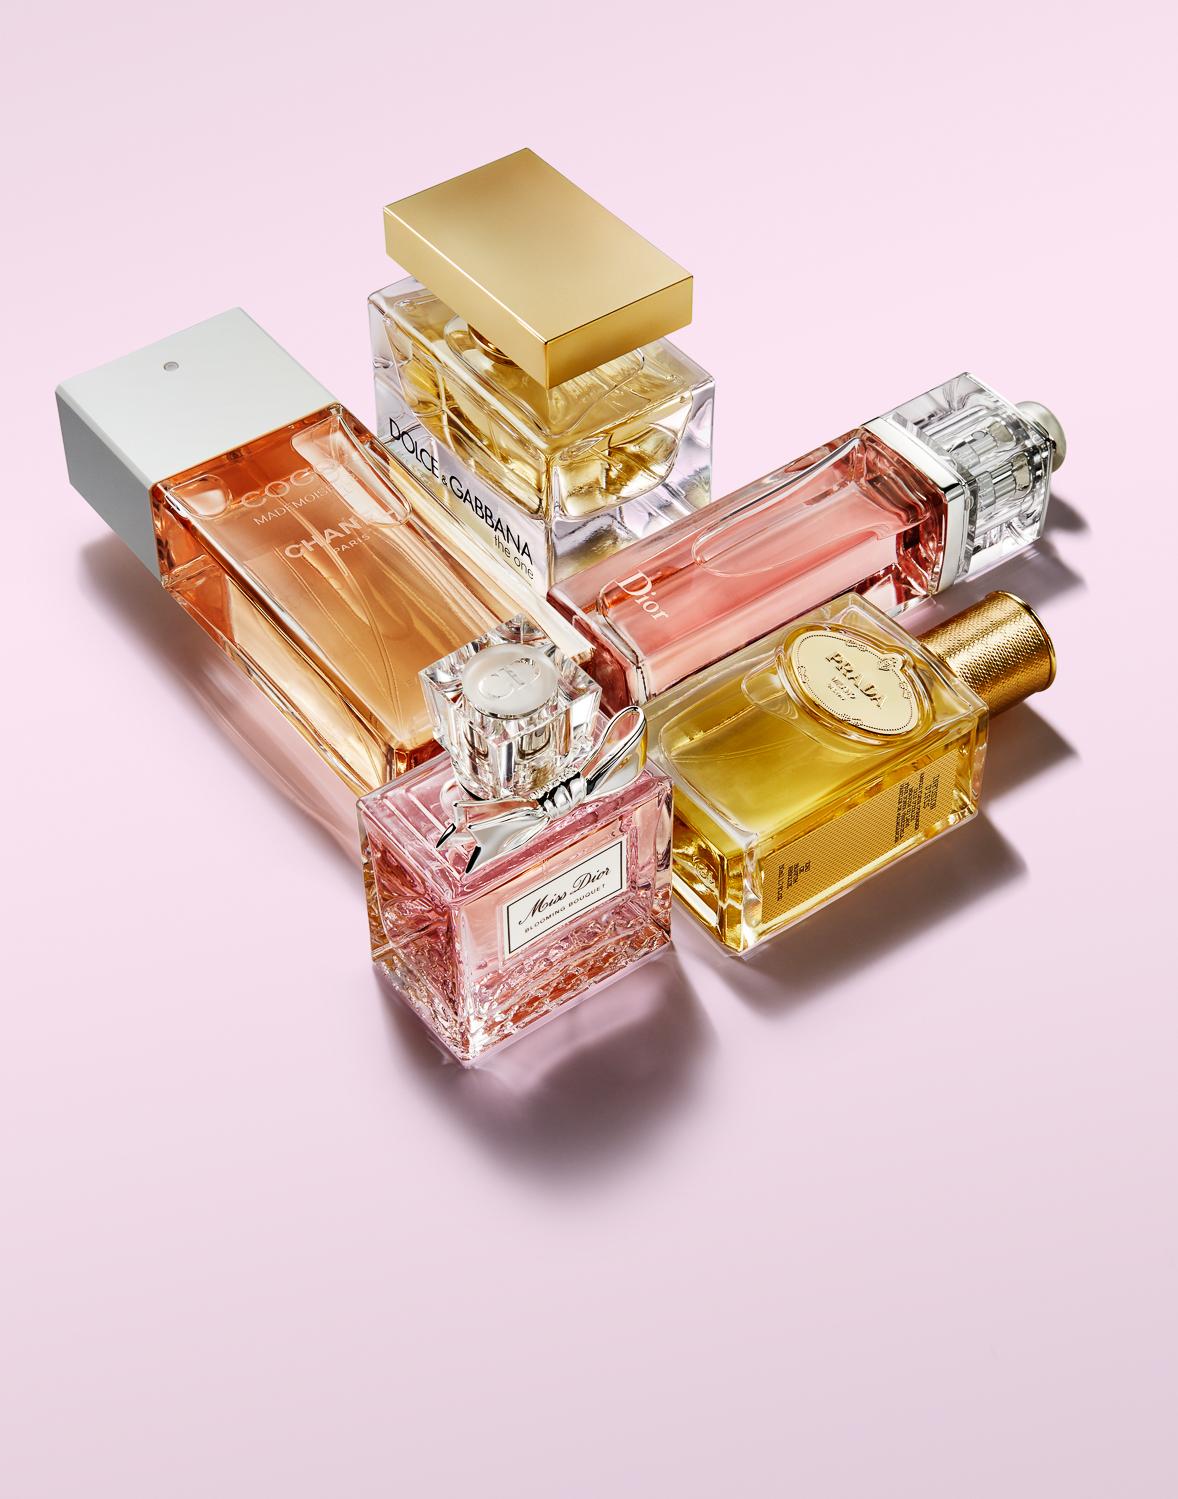 151008 Cosmetics Fragrance Group.jpg